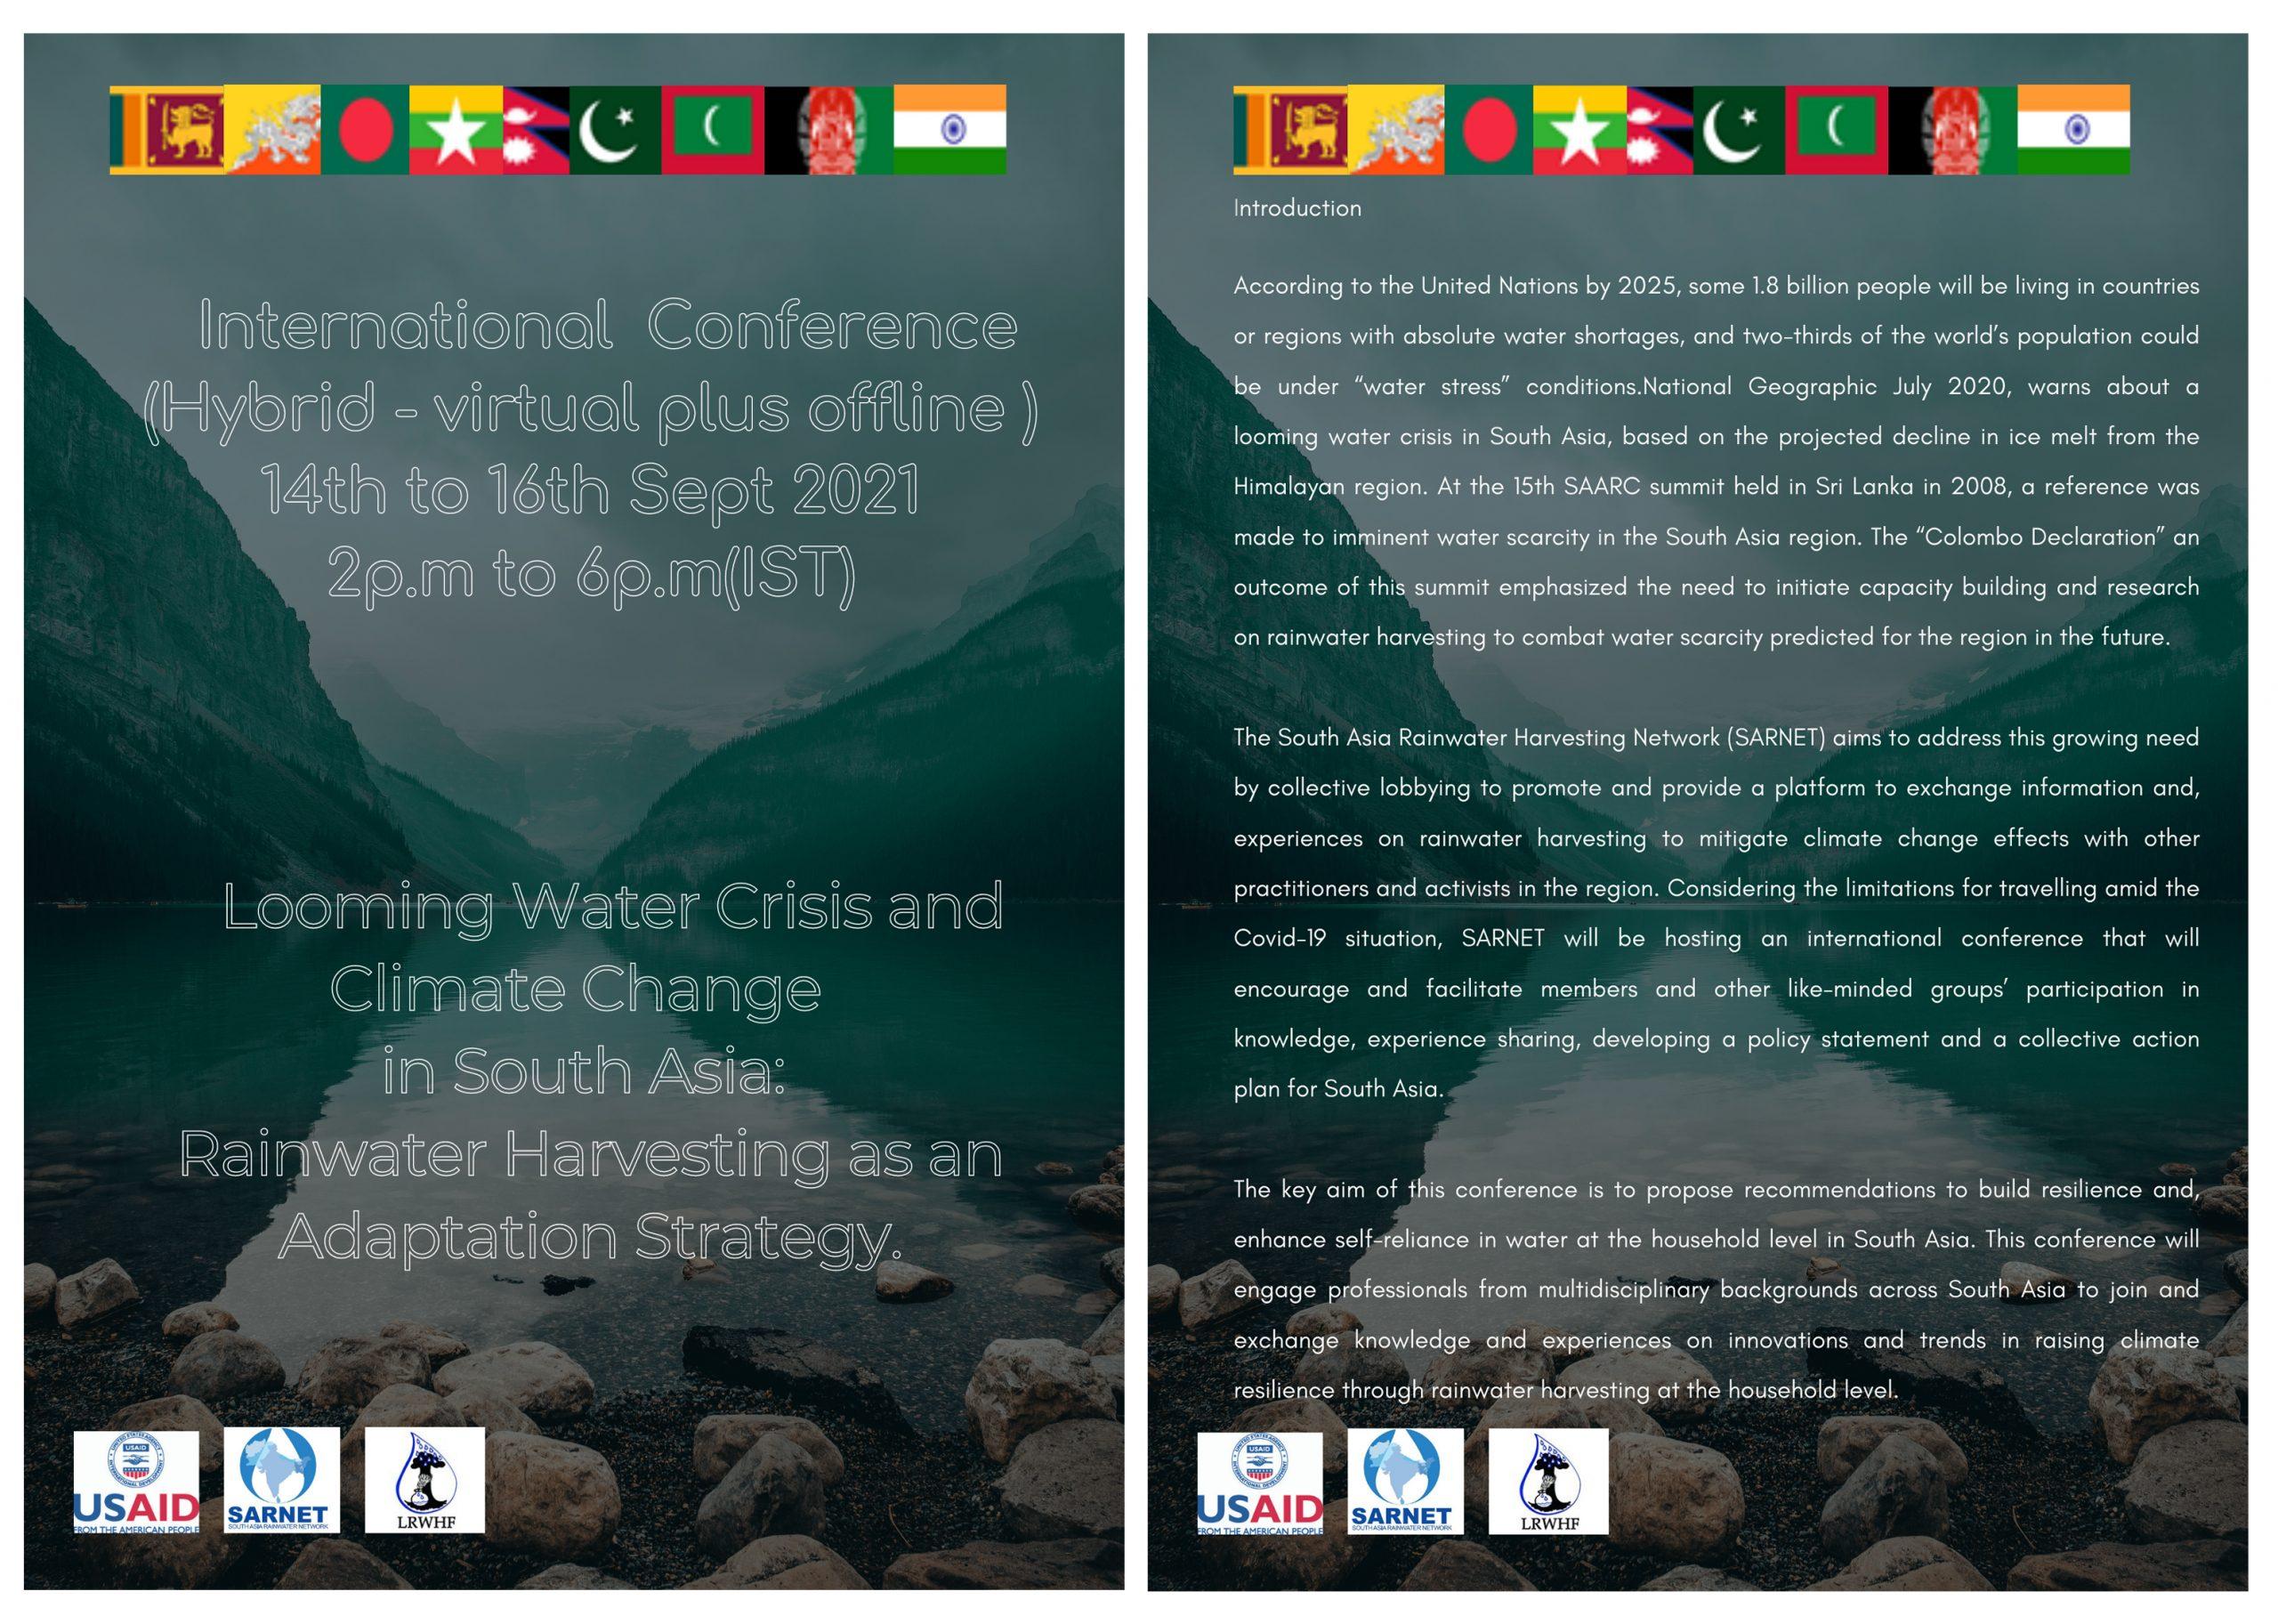 International conference post 1